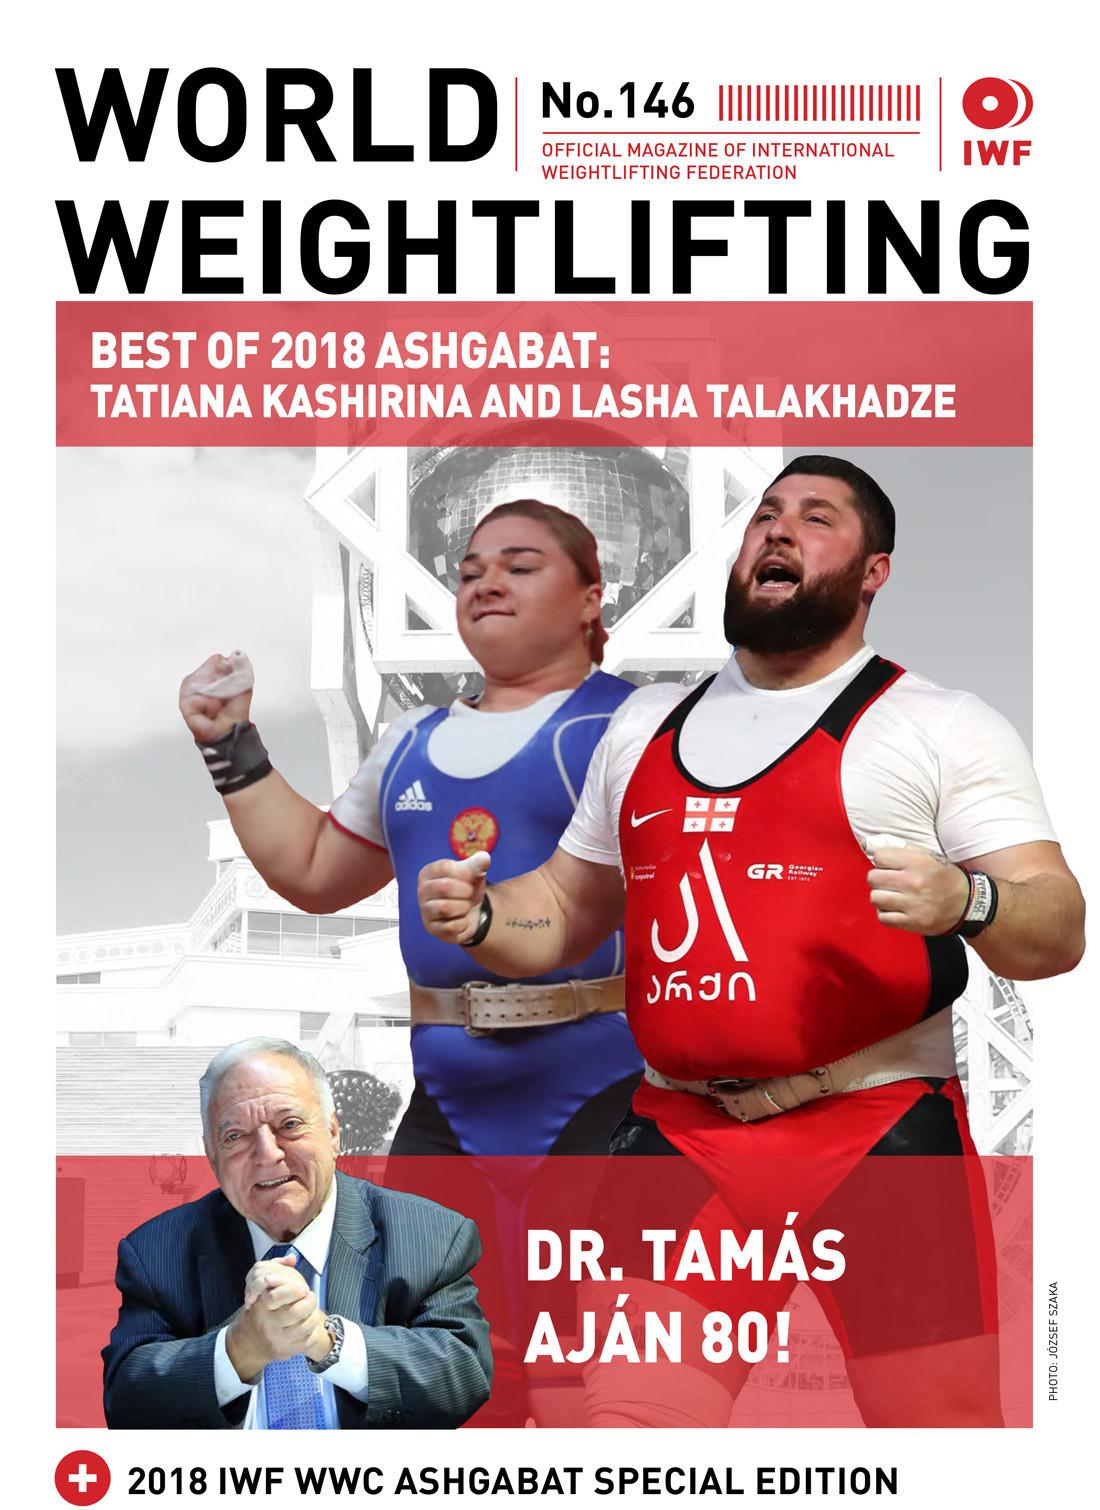 World Weightlifting Magazine No. 146